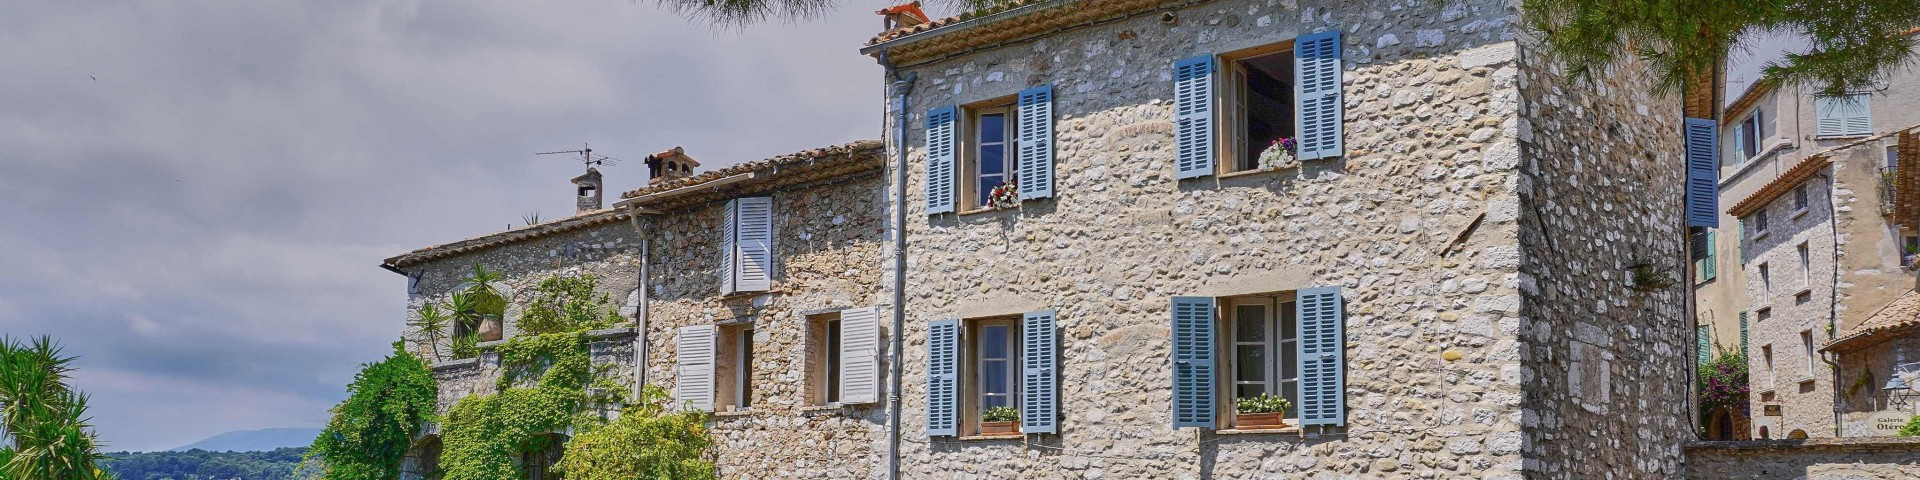 Beautiful stone houses